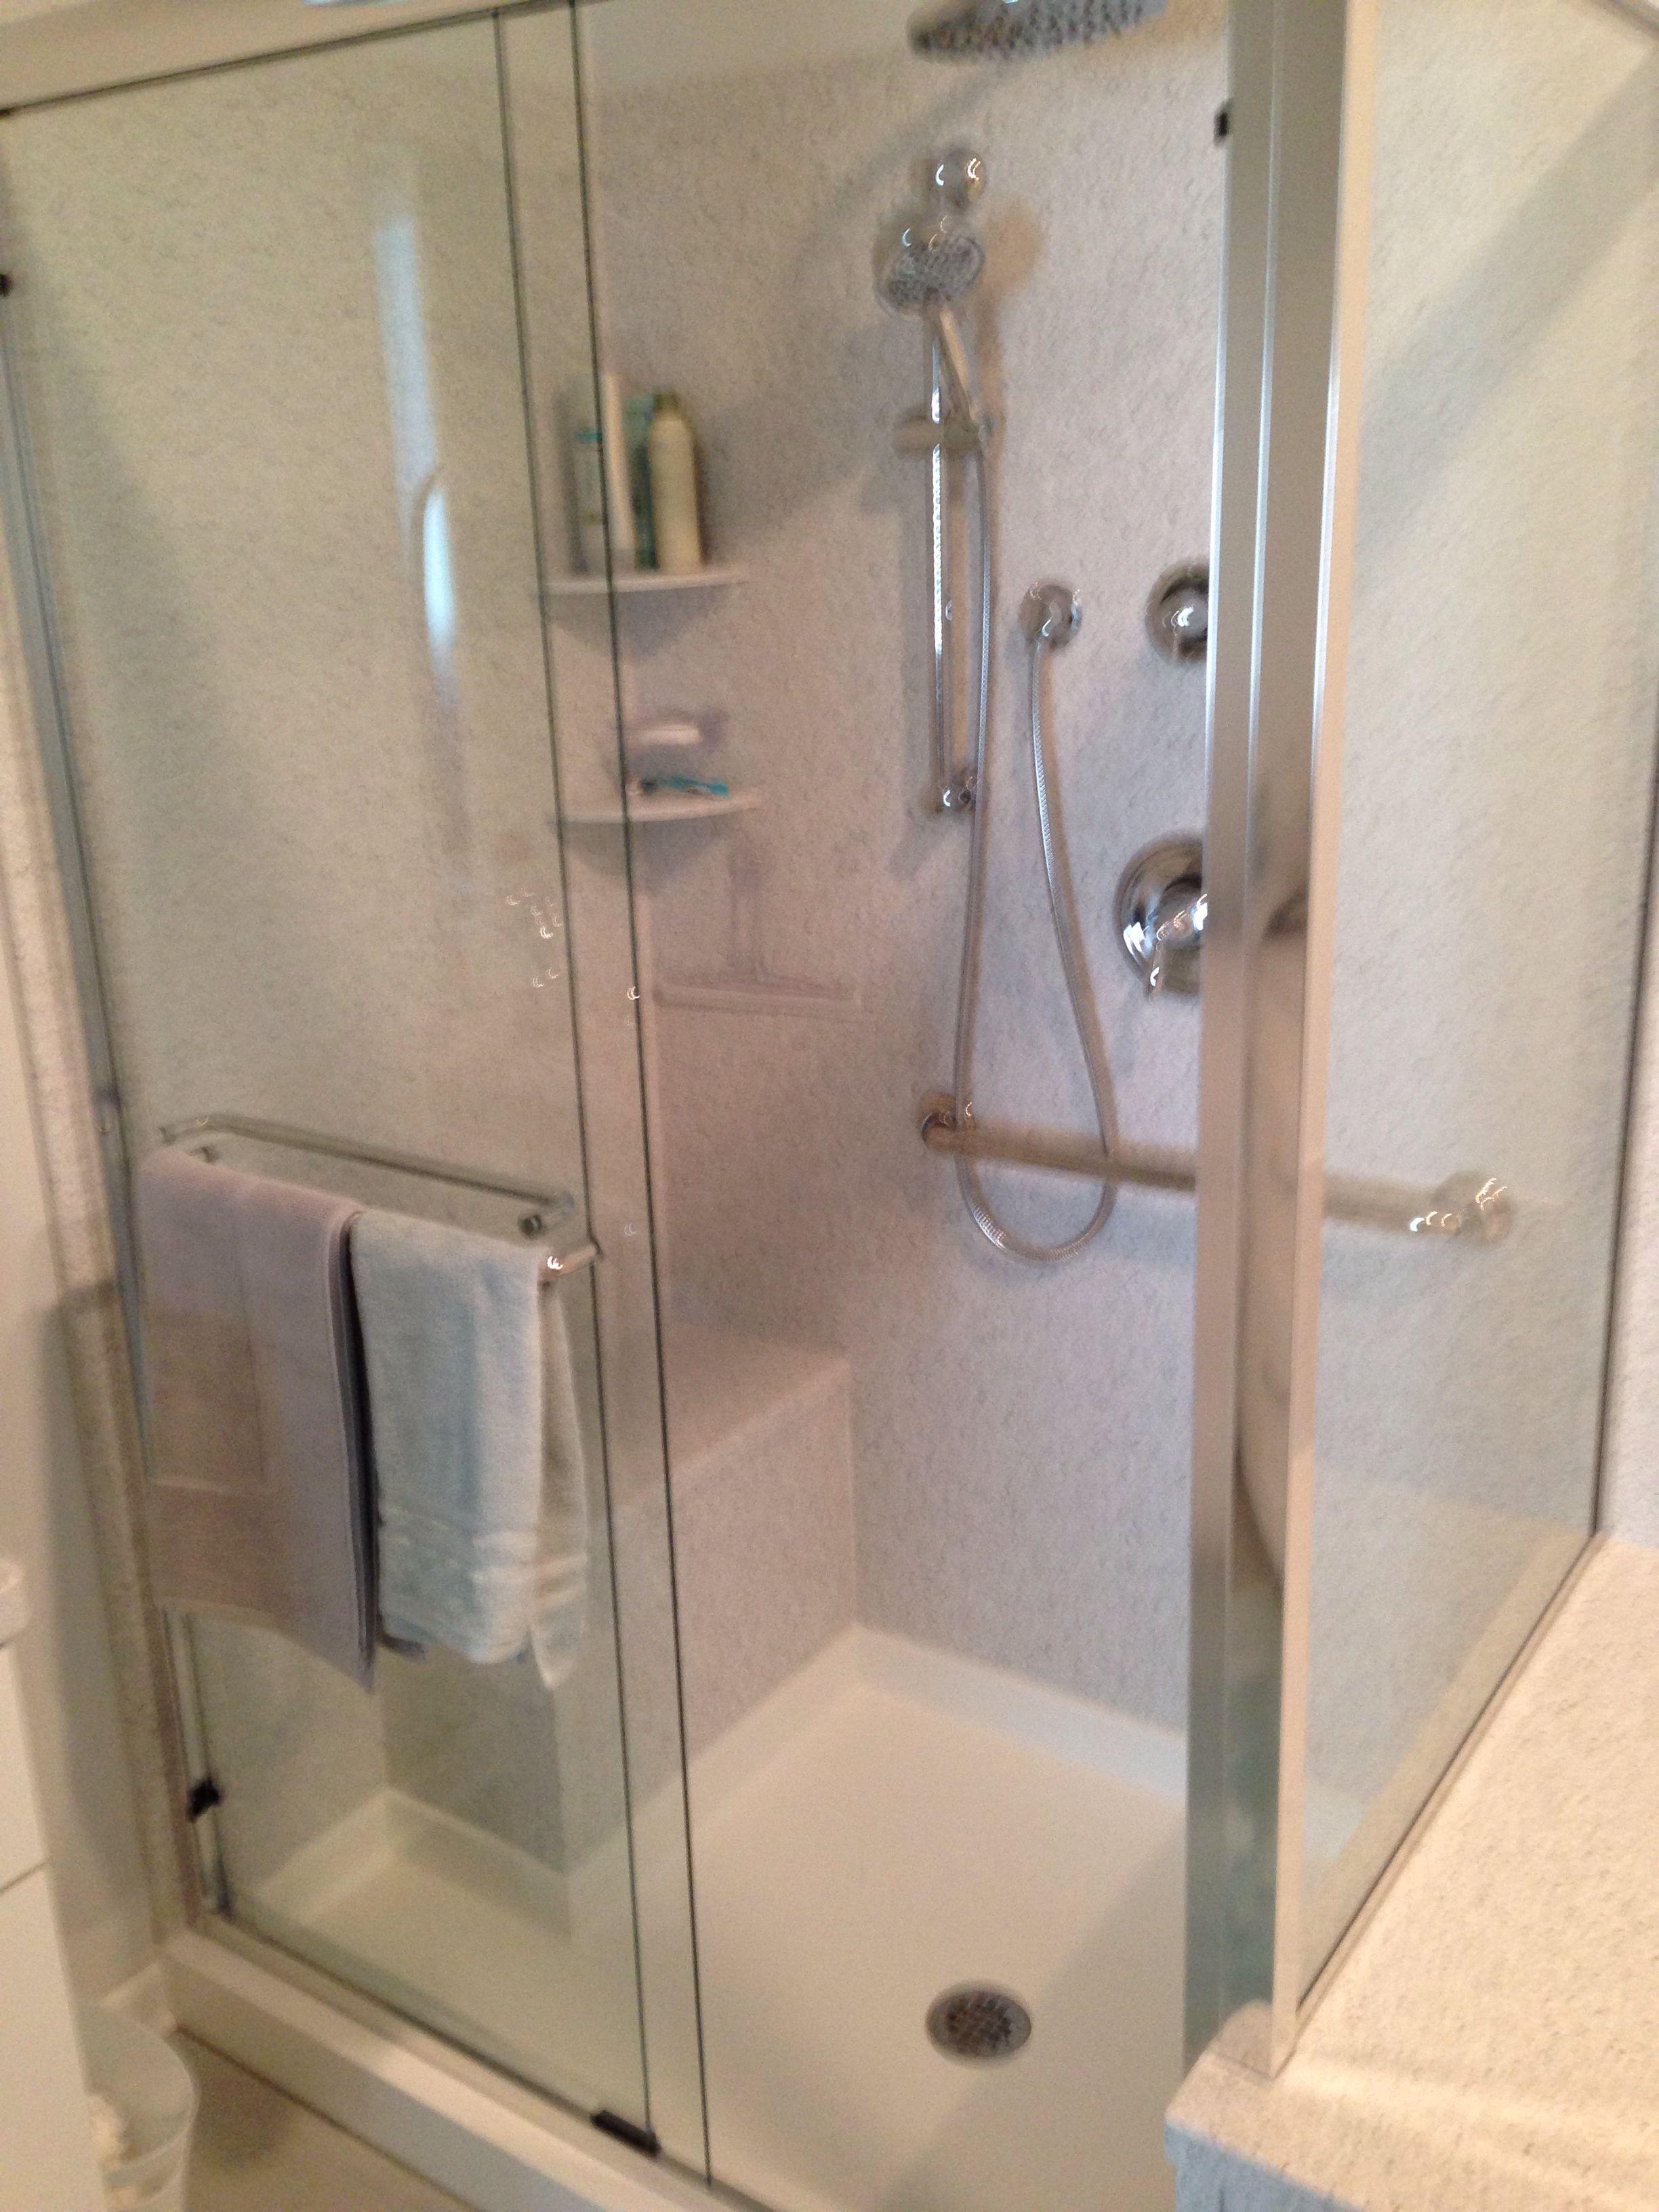 A Beautiful Corian Shower Surround With A Custom Corian Shower